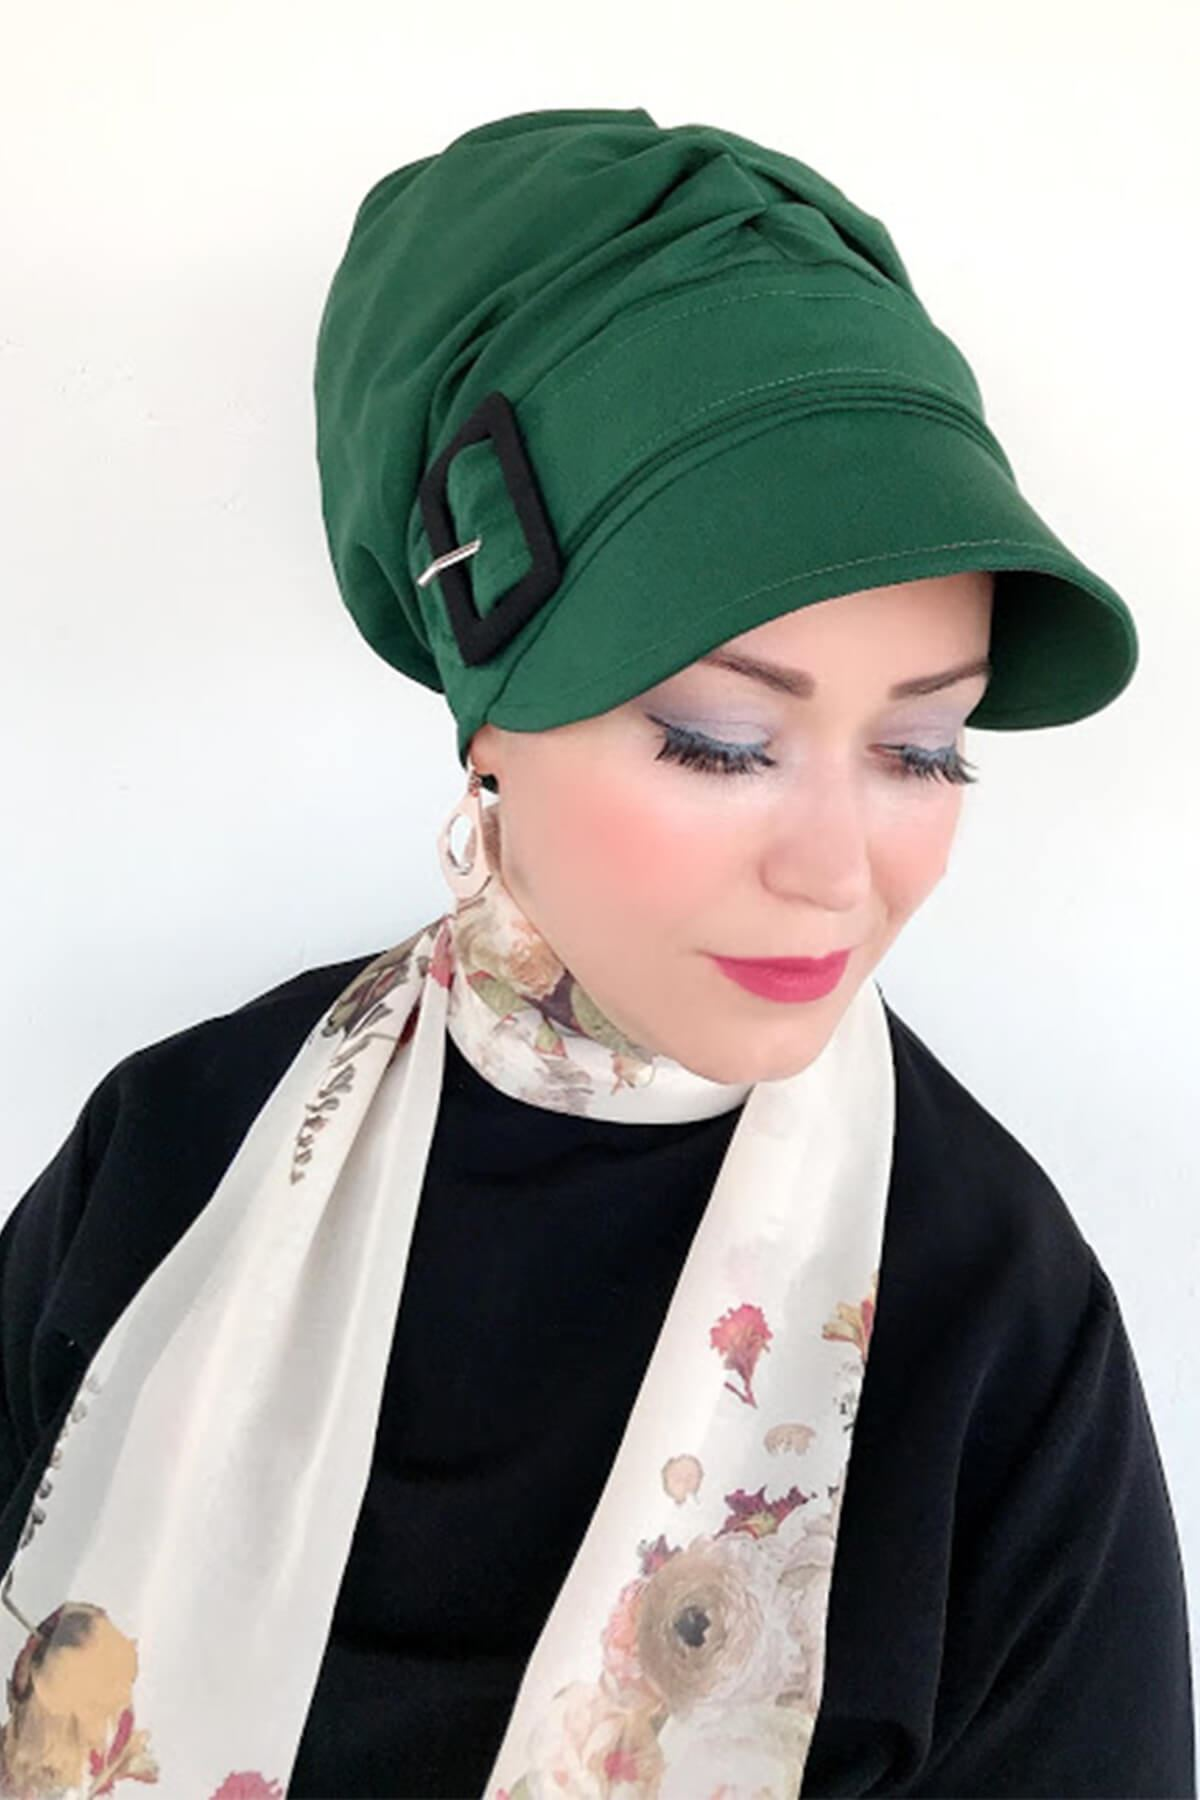 Koyu Yeşil Siyah Tokalı Şapka